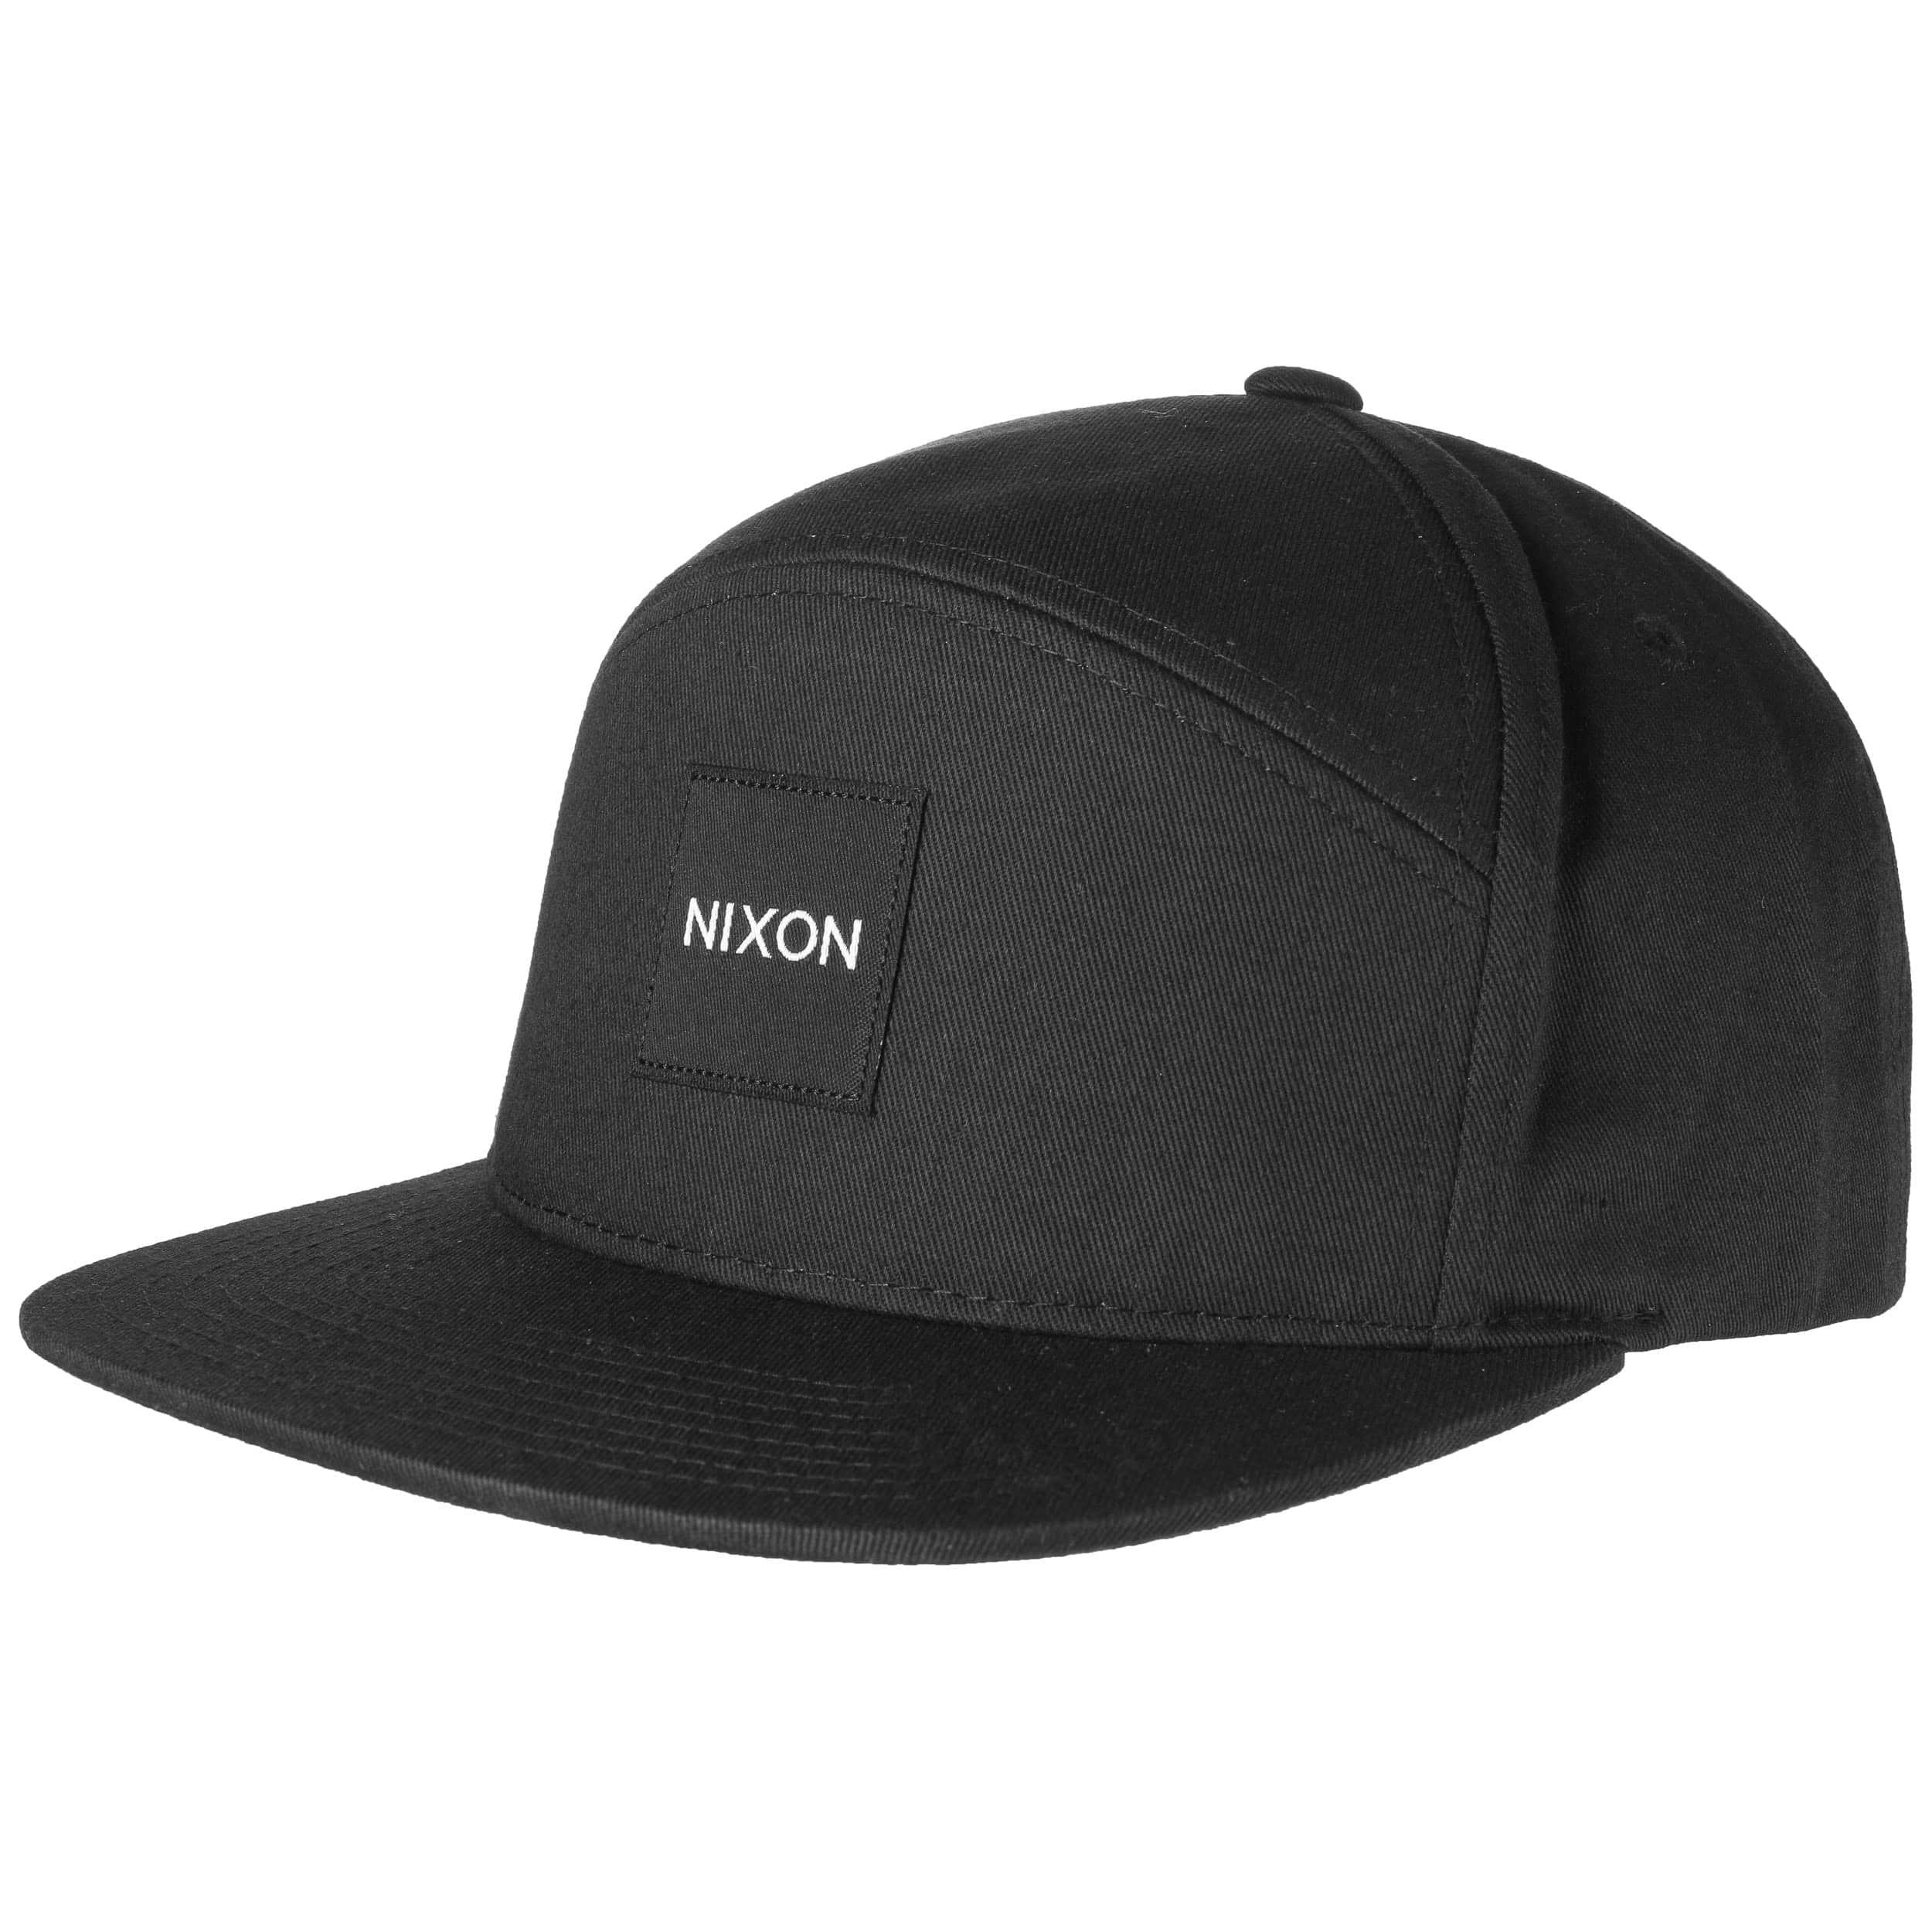 a4e8dfcd146 ... Snapper Snapback Cap by Nixon - black 4